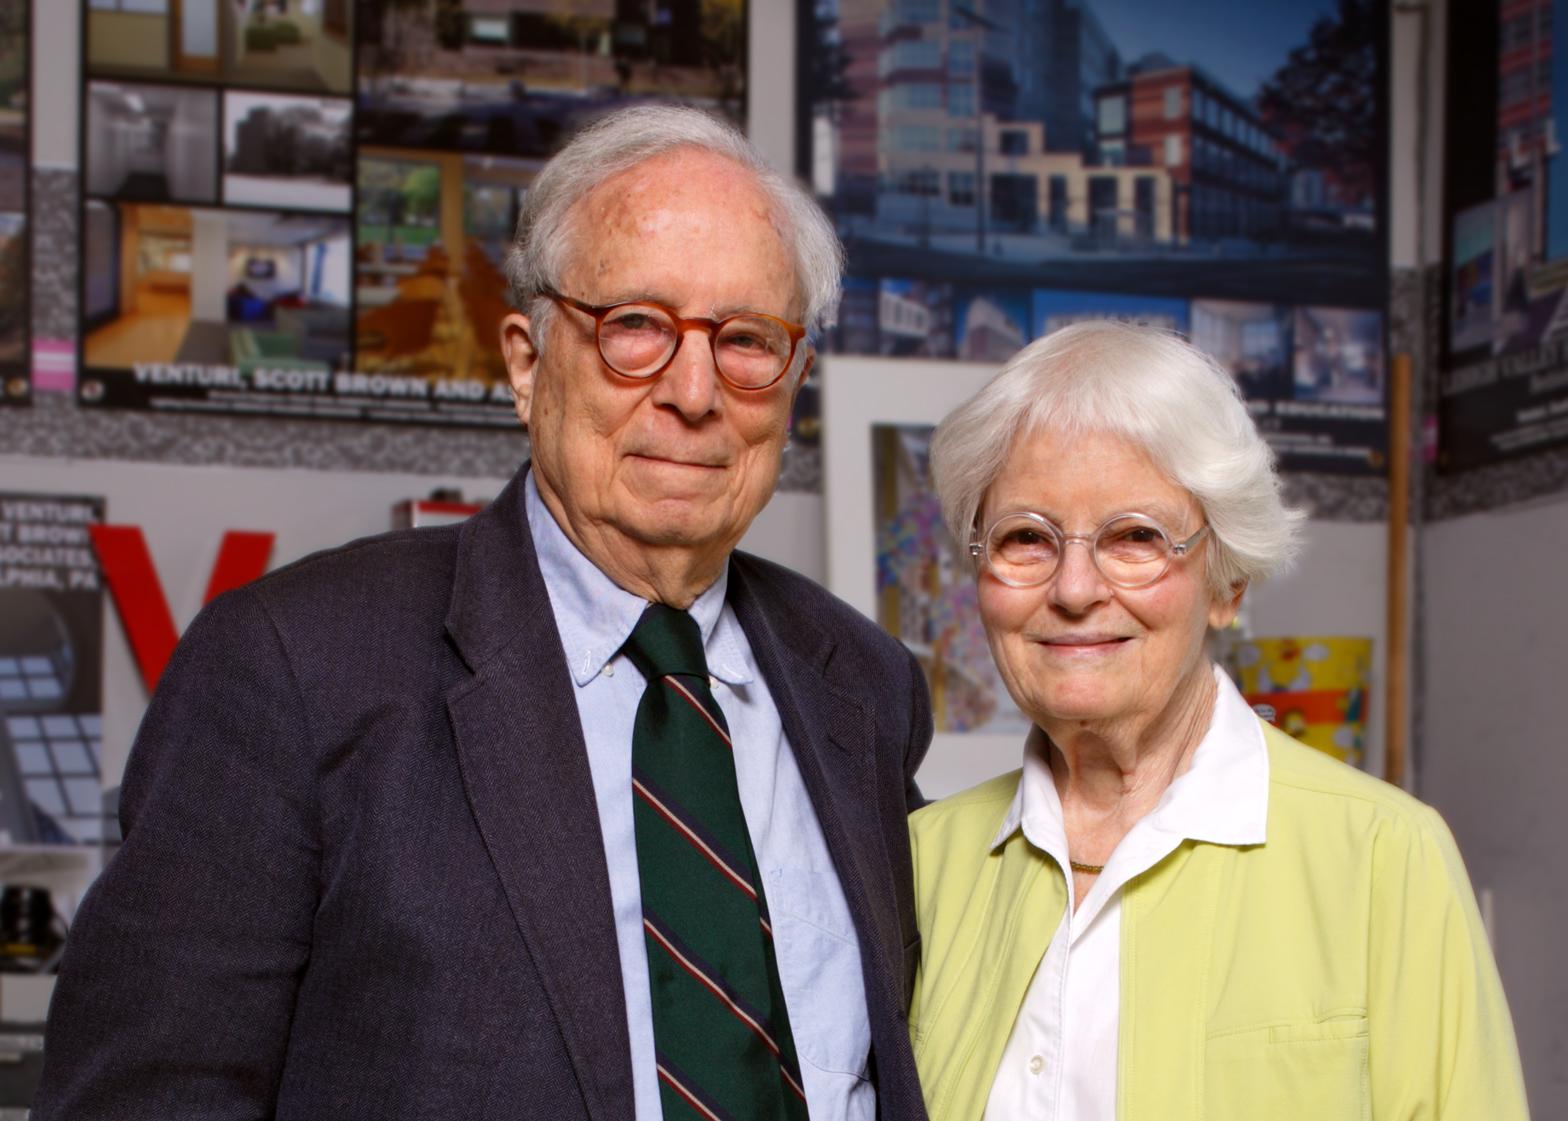 Robert Venturi + Denise Scott Brown, recipients of the 2016 AIA Gold Medal